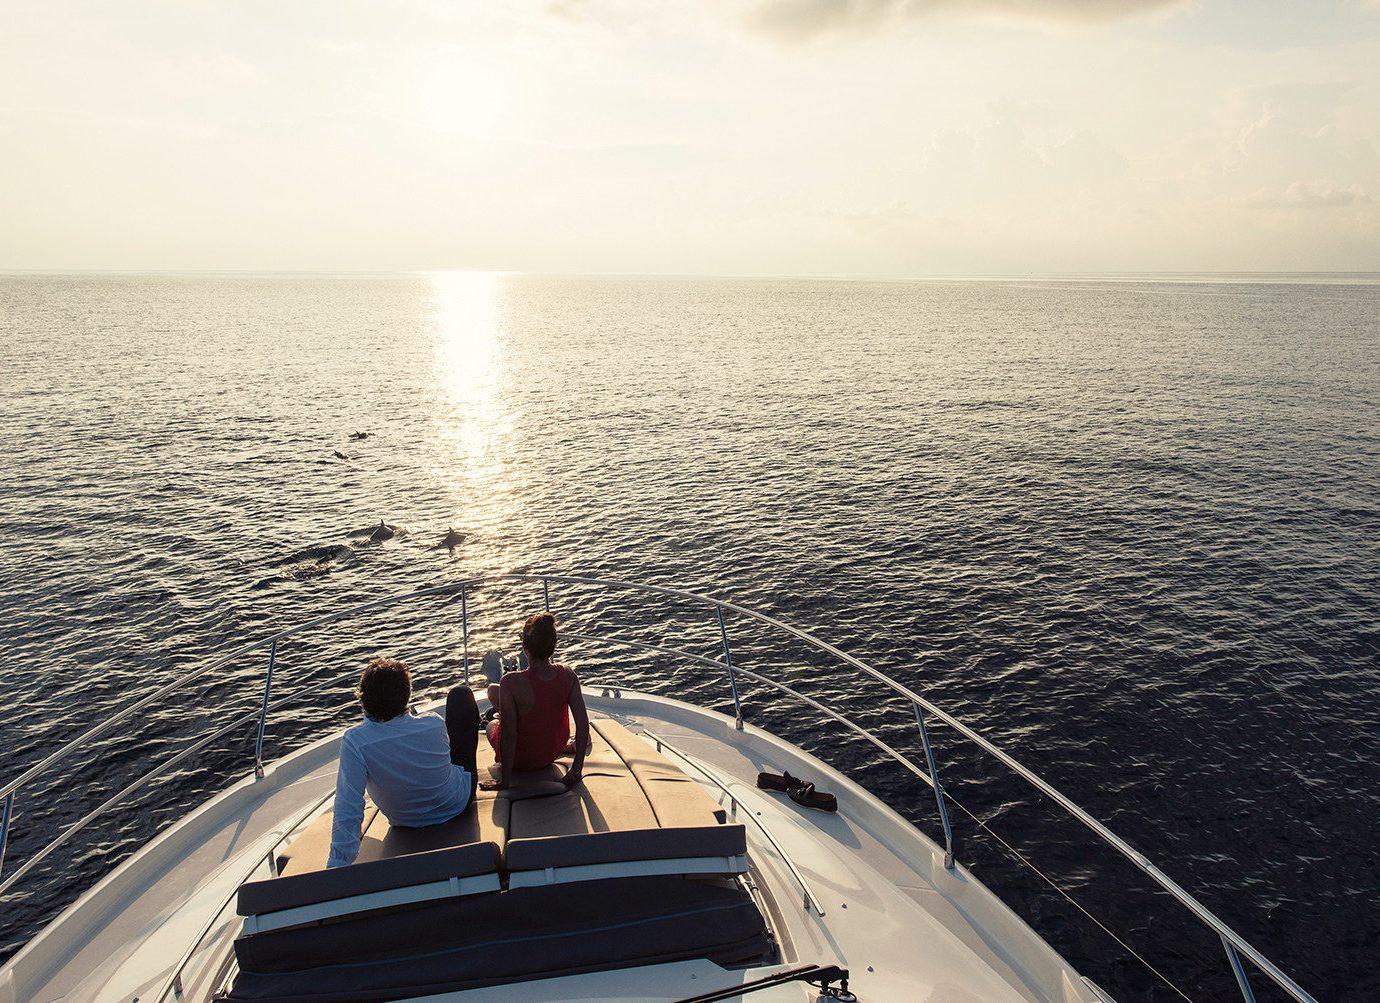 Luxury Travel Trip Ideas water outdoor sky Boat vehicle passenger ship Sea horizon yacht sailing luxury yacht Ocean ship watercraft